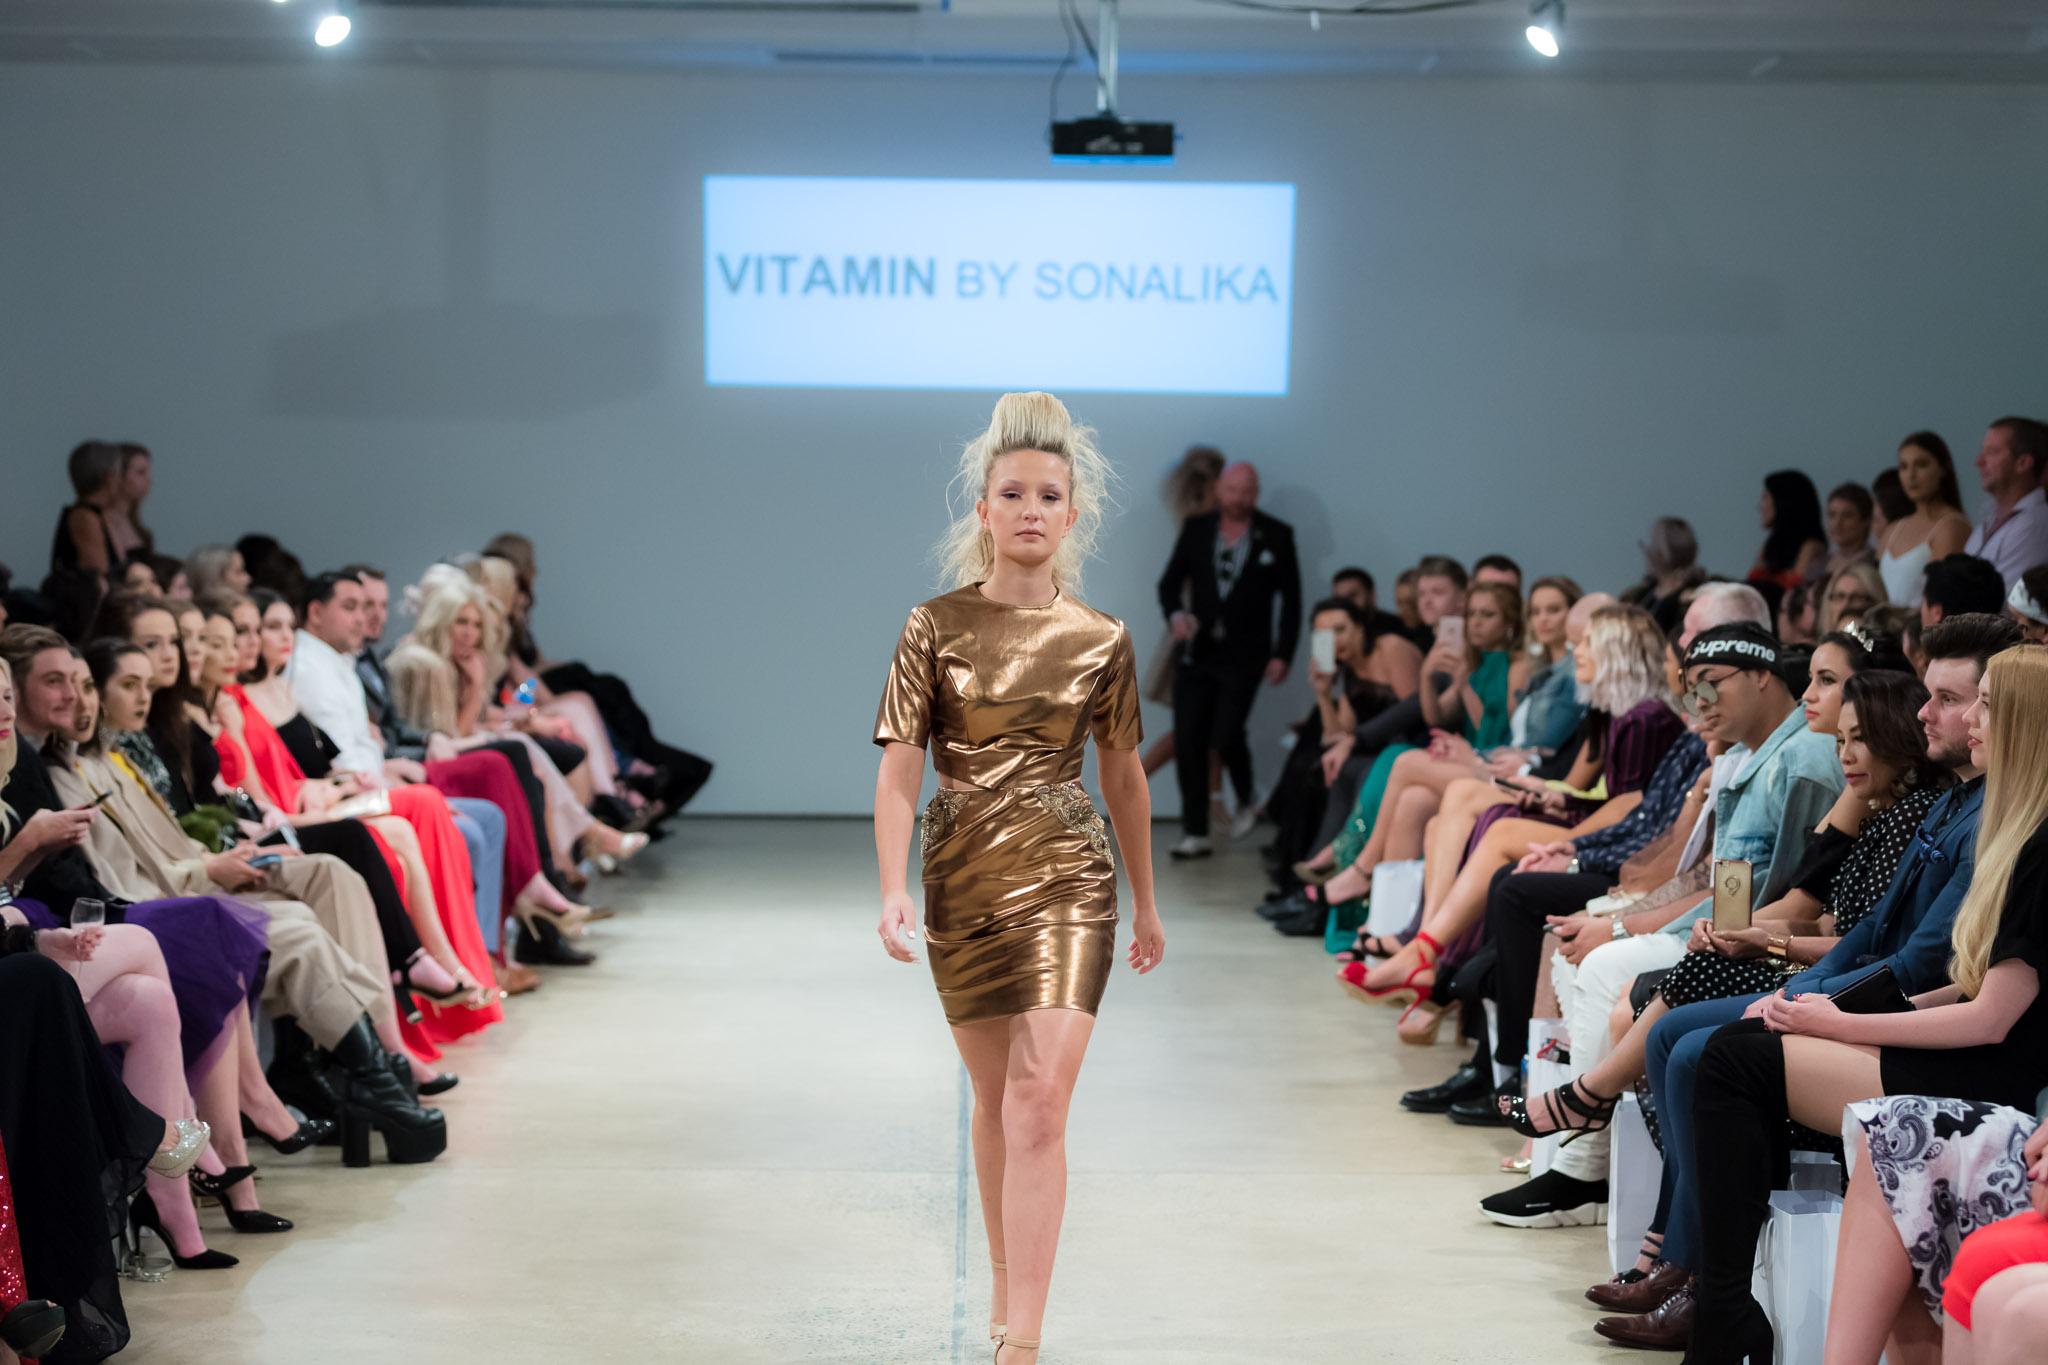 Vitamin By Sonalika